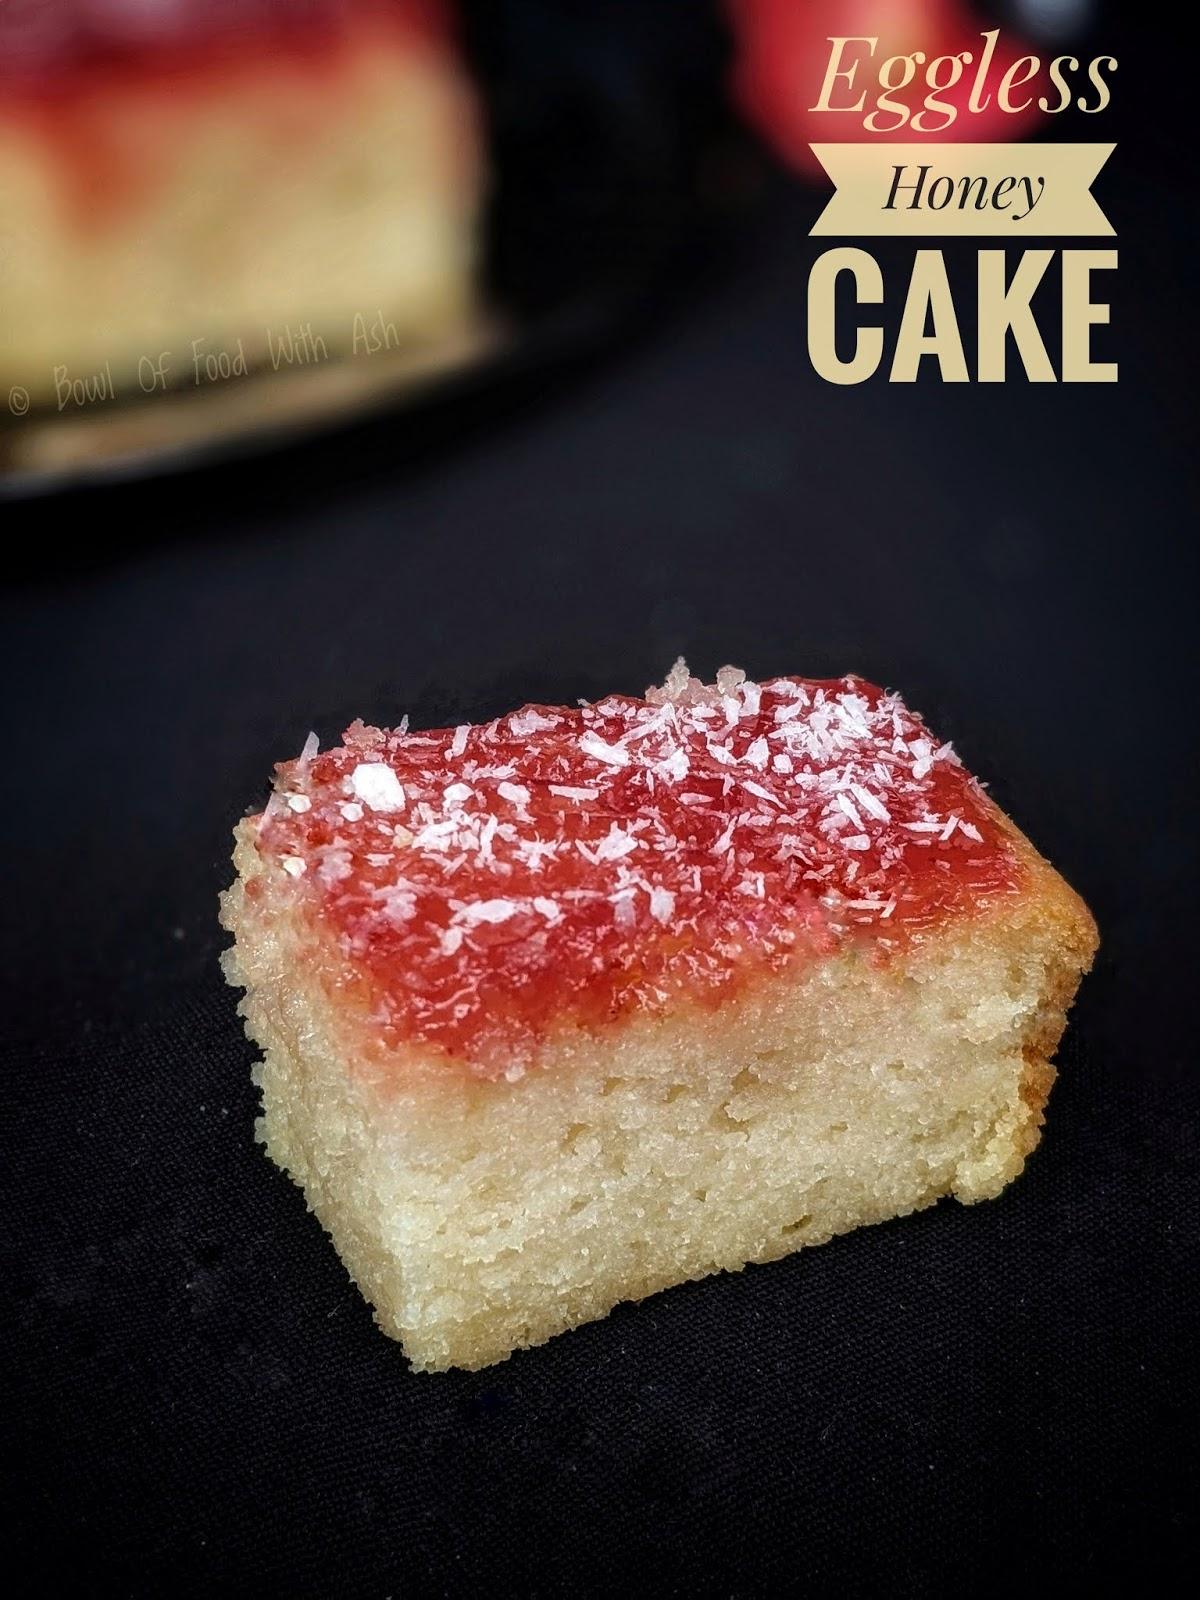 Bowl Of Food With Ash Eggless Honey Cake Recipe How To Make Indian Bakery Style Honey Cake